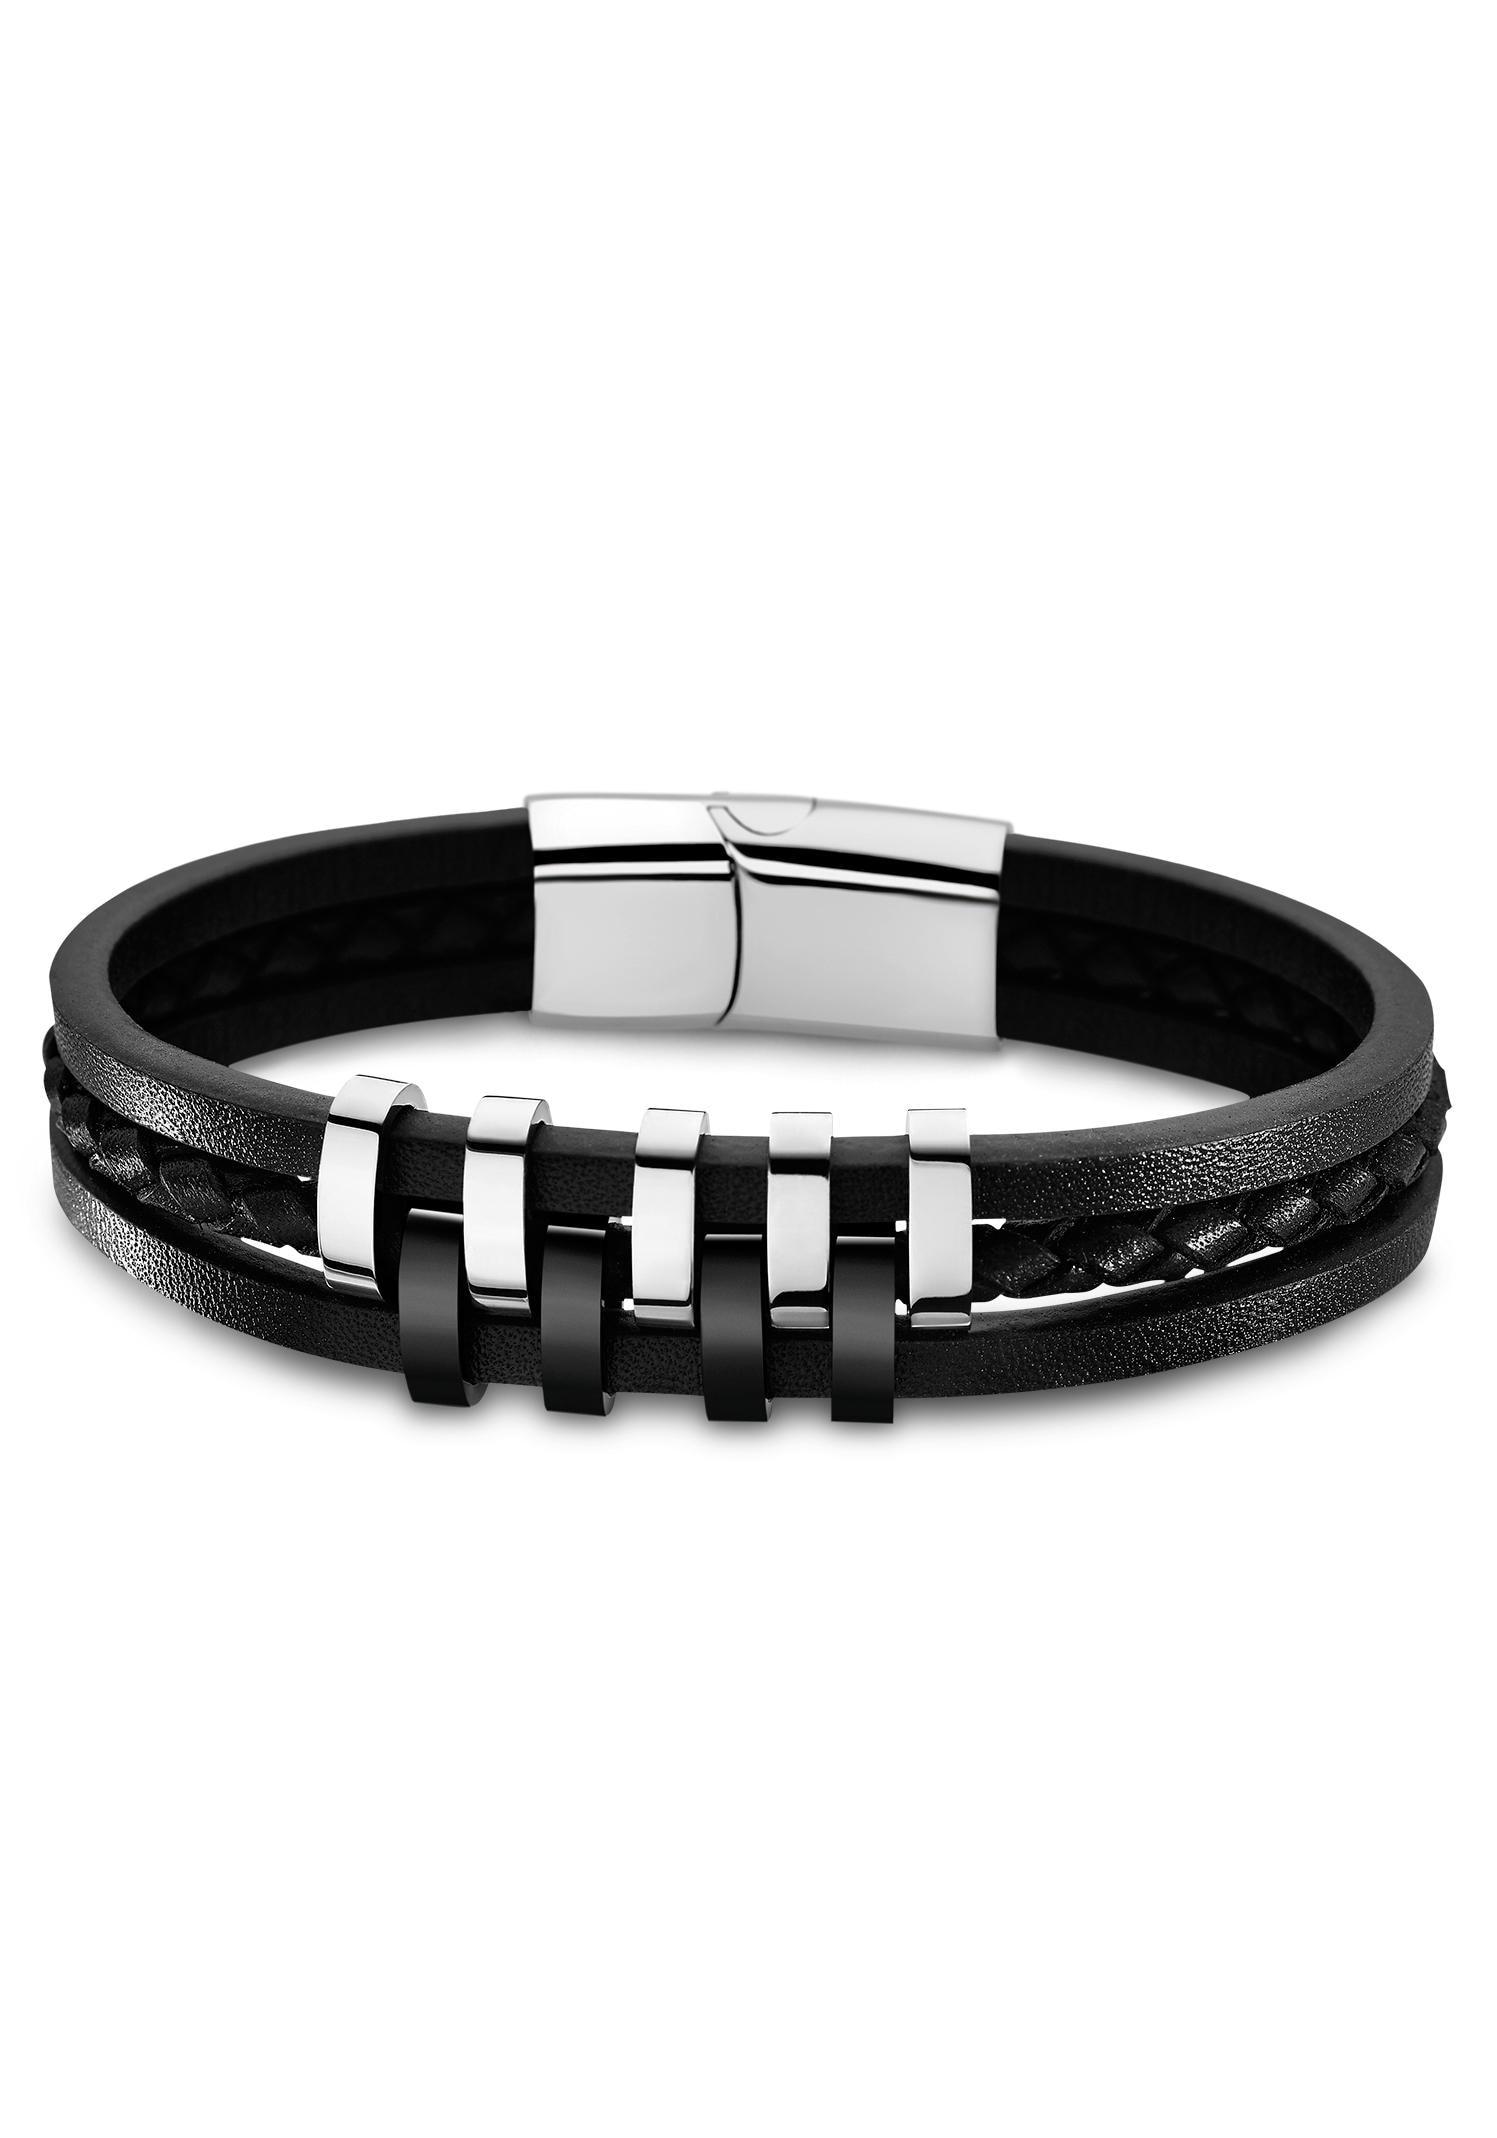 Lotus Style Armband LS1838-2/1   Schmuck > Armbänder > Sonstige Armbänder   Schwarz   Leder   Lotus Style